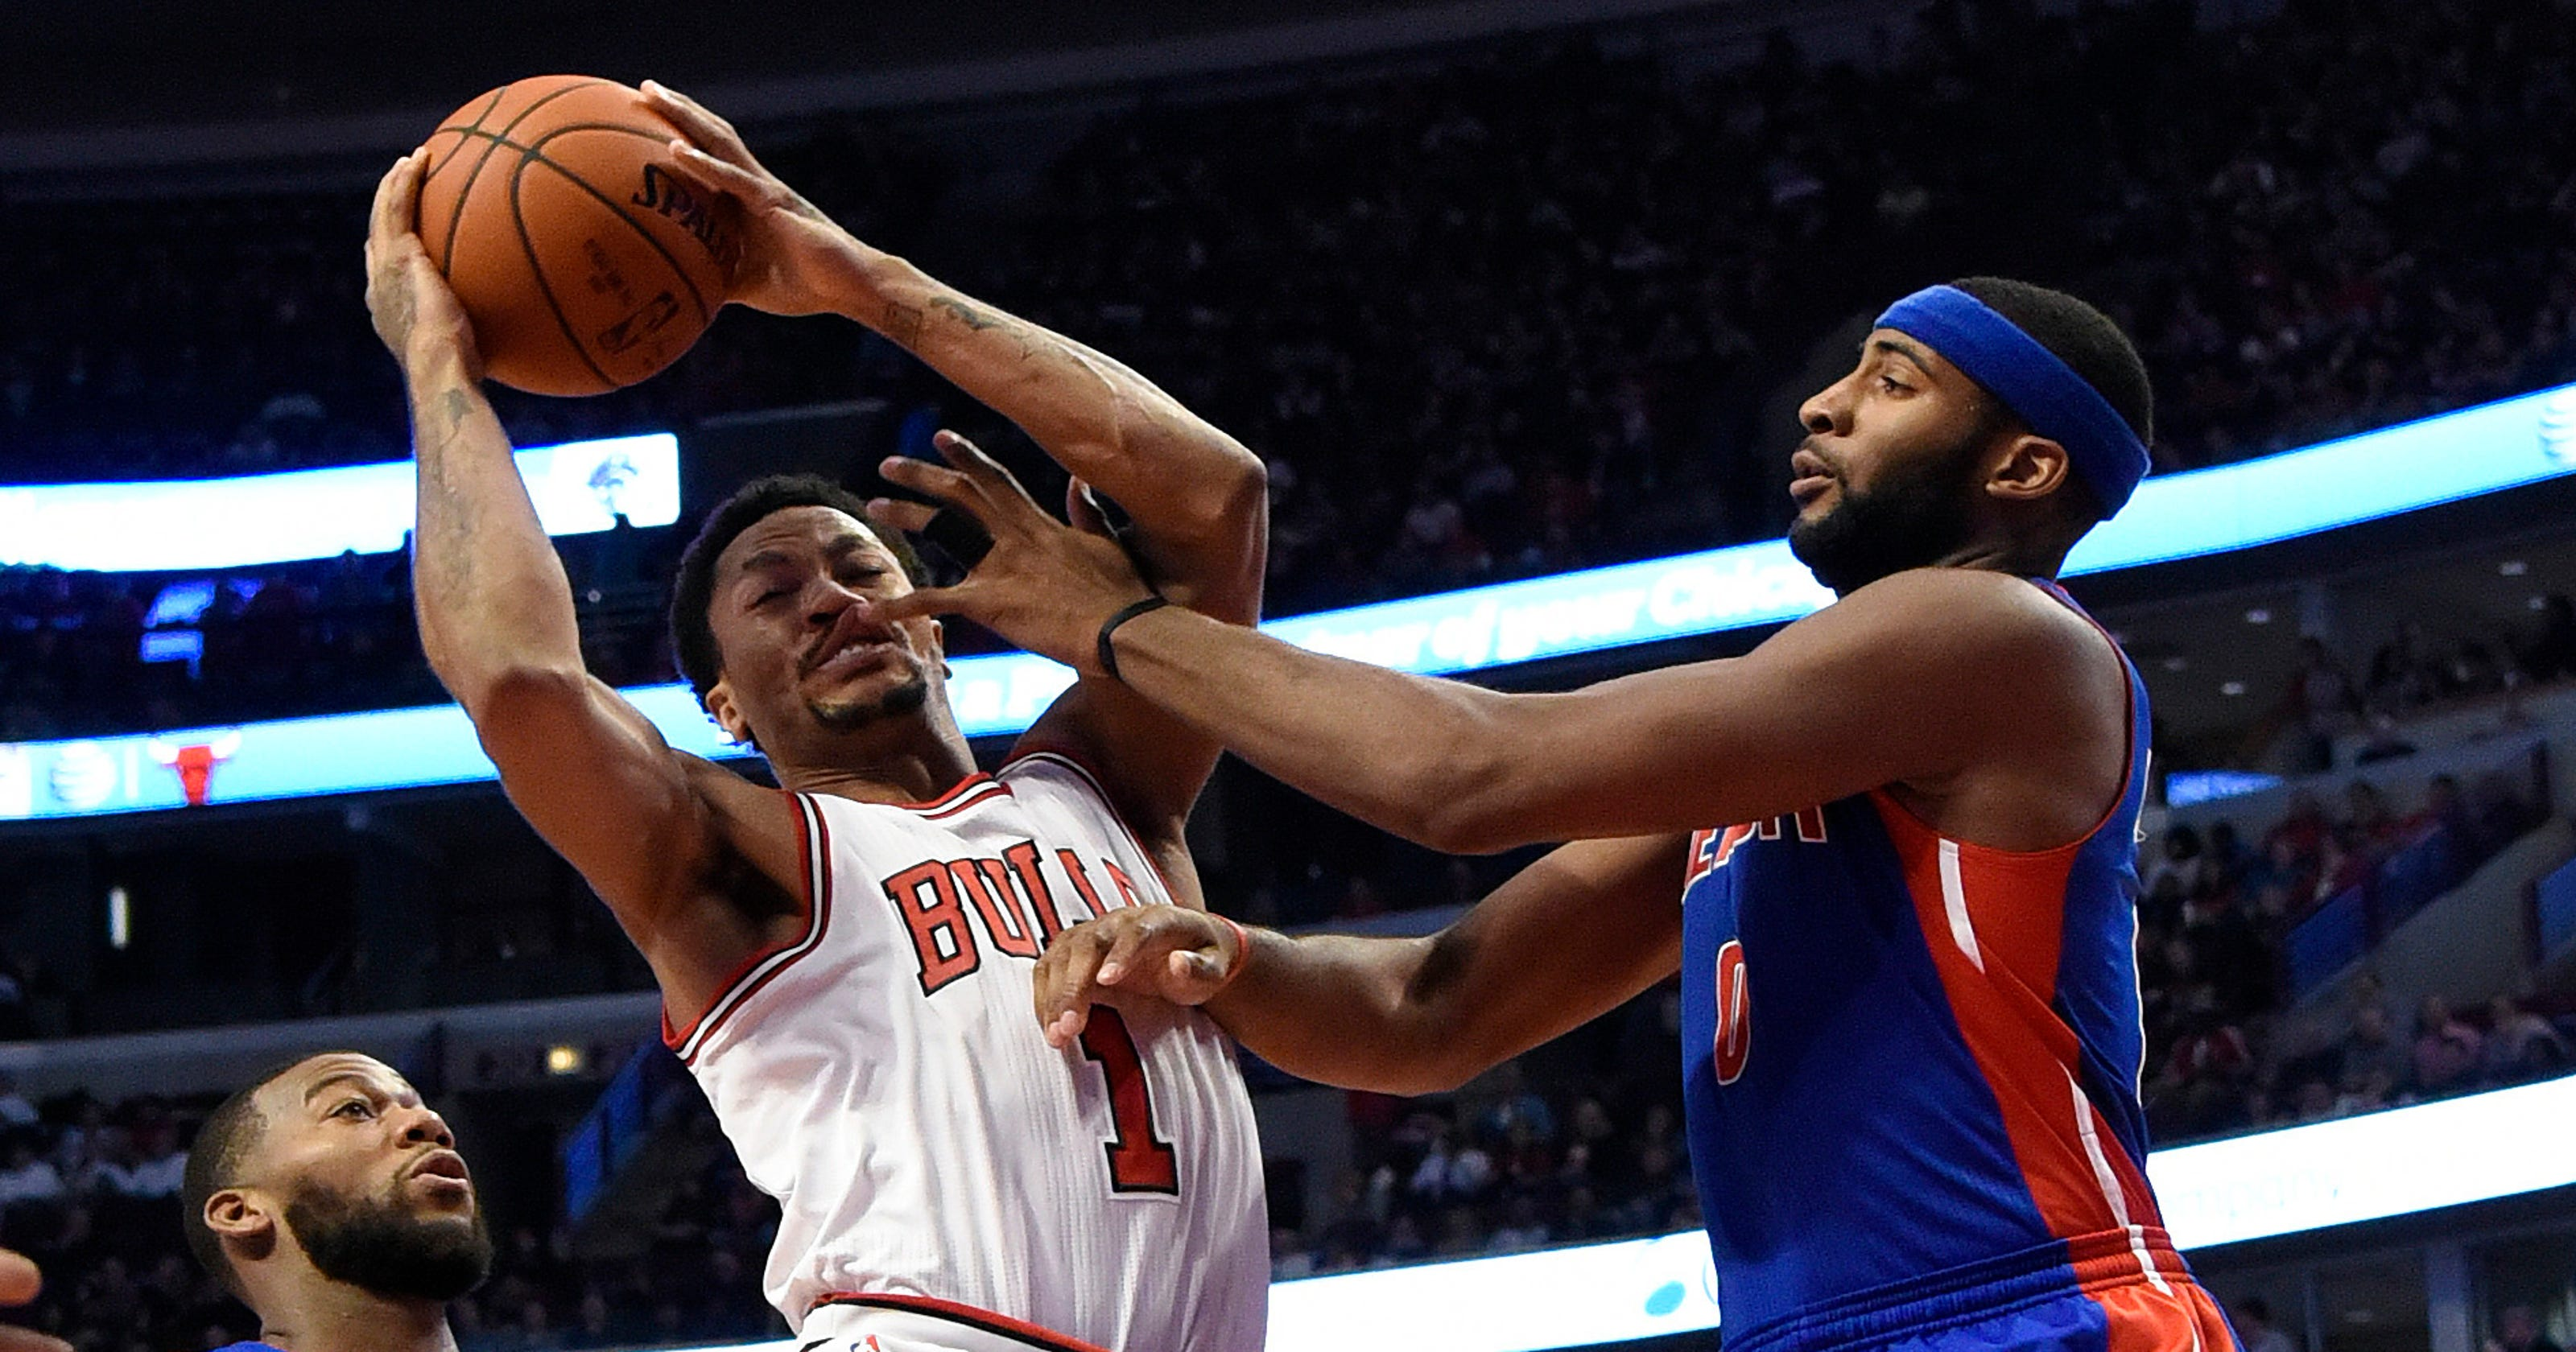 83d9e98e92ff Derrick Rose back in lineup to help Bulls beat Pistons